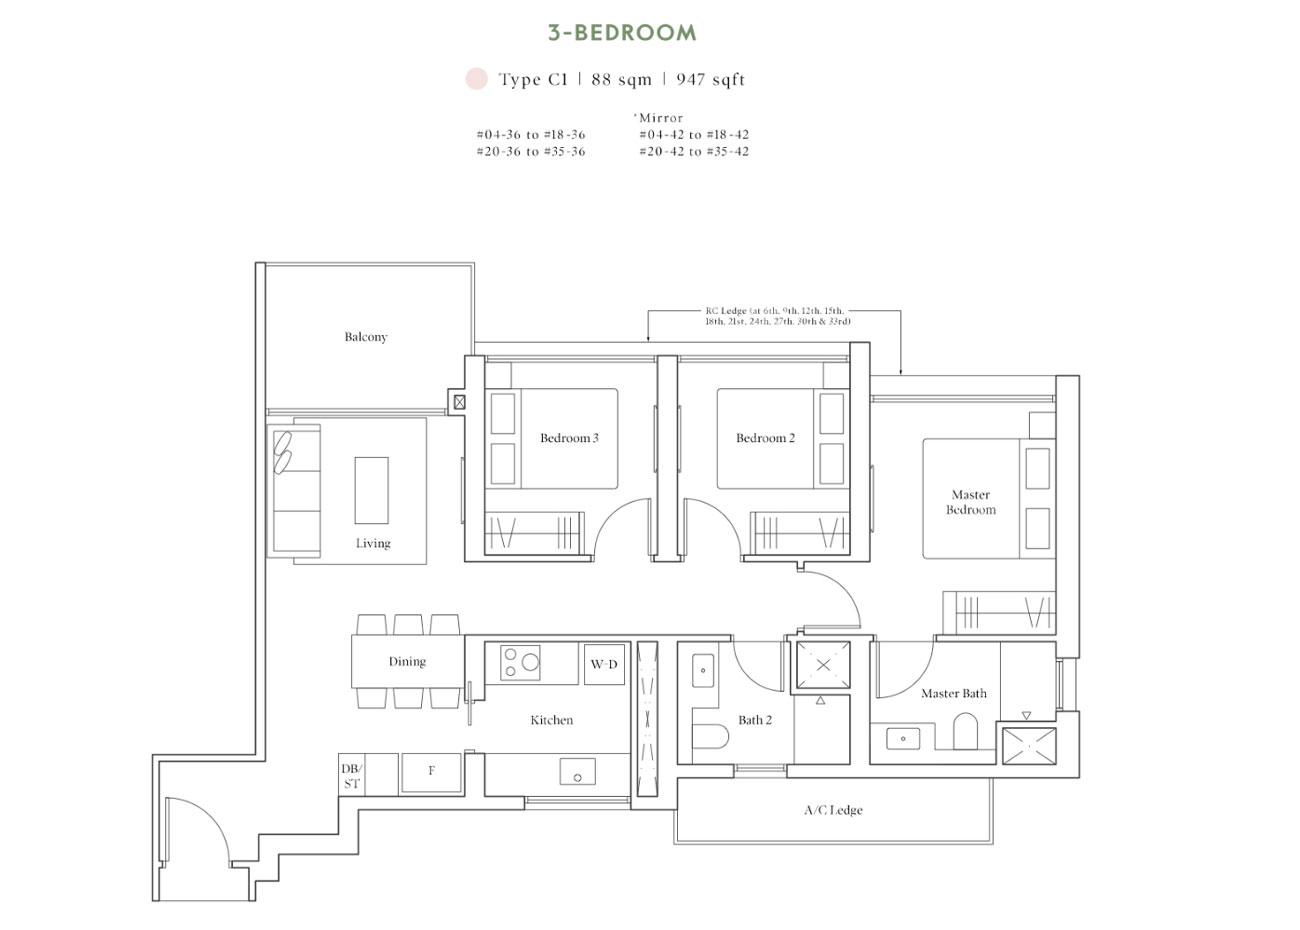 Horizon Collection - 3 Bedroom, C1